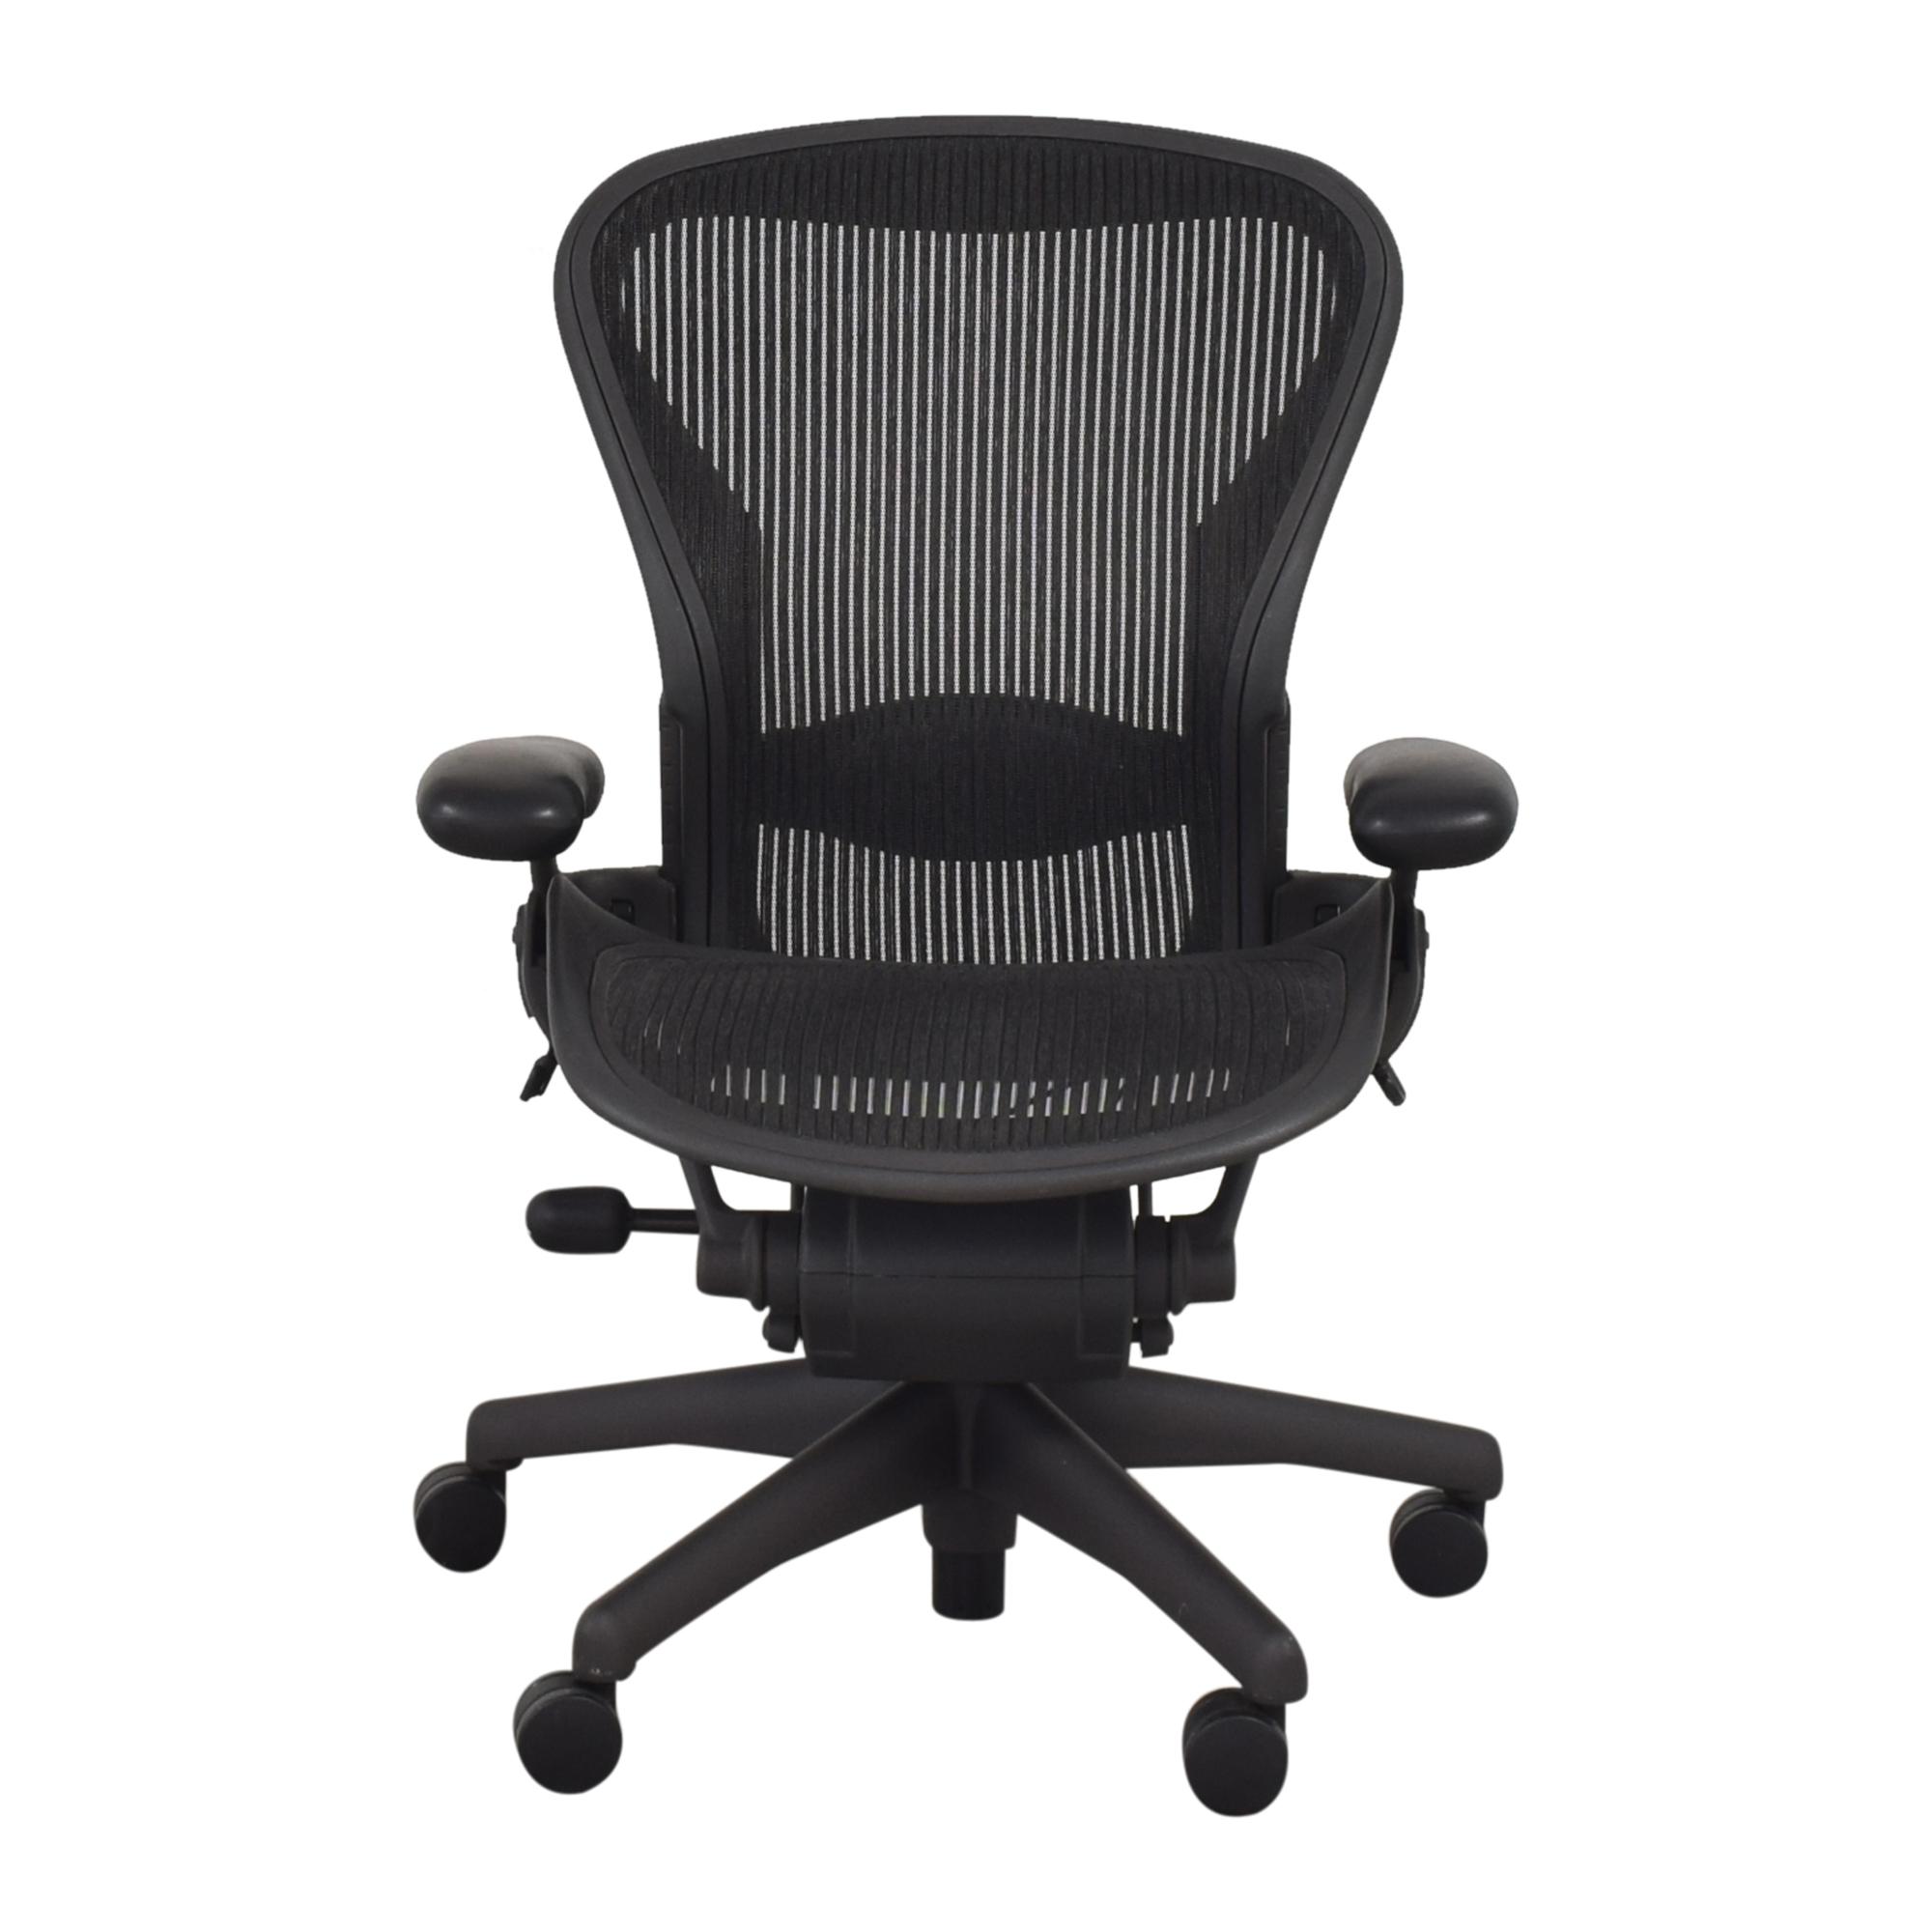 Herman Miller Herman Miller Aeron Size B Swivel Desk Chair nyc